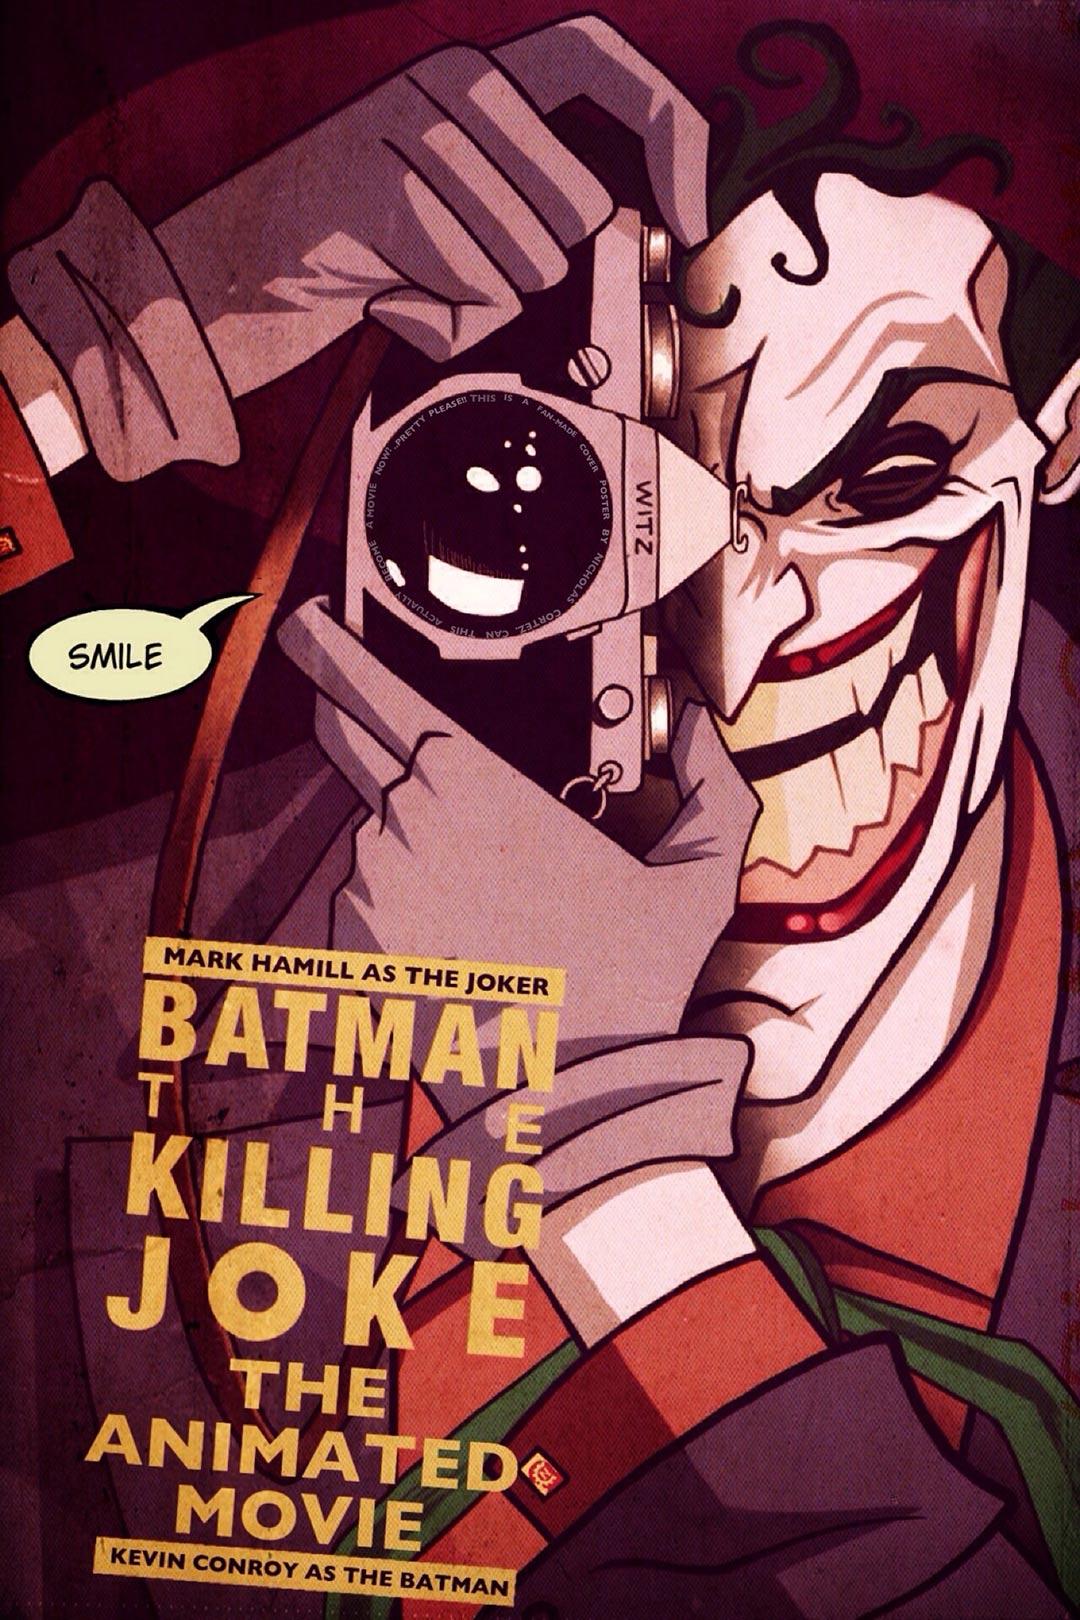 Cine y series de animacion - Página 6 Batman-killing-joke-poster